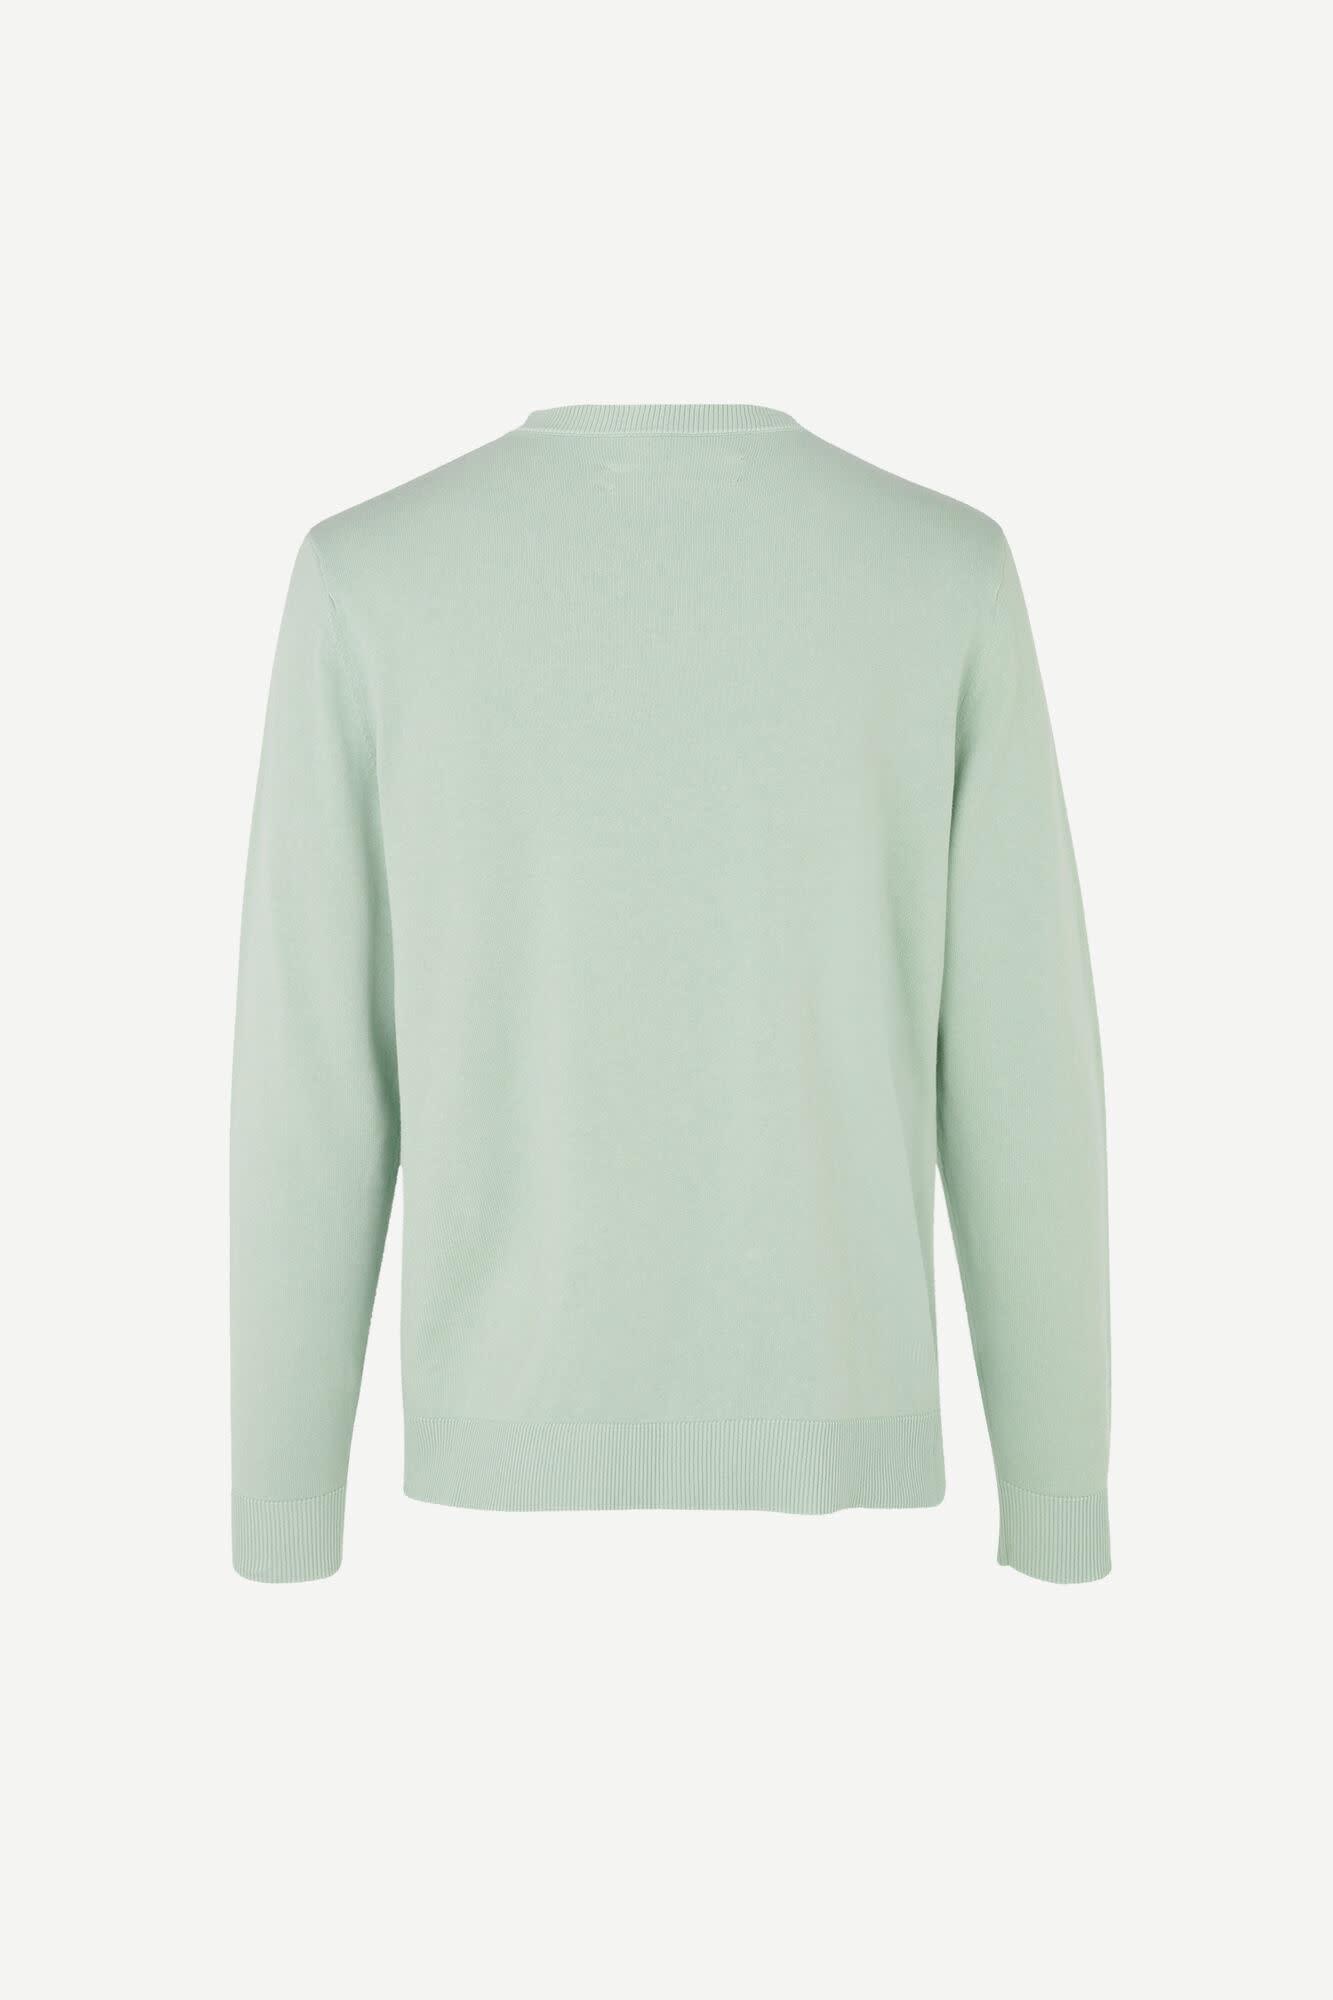 Ferris Frosty Green Crew Neck Sweatshirt-2